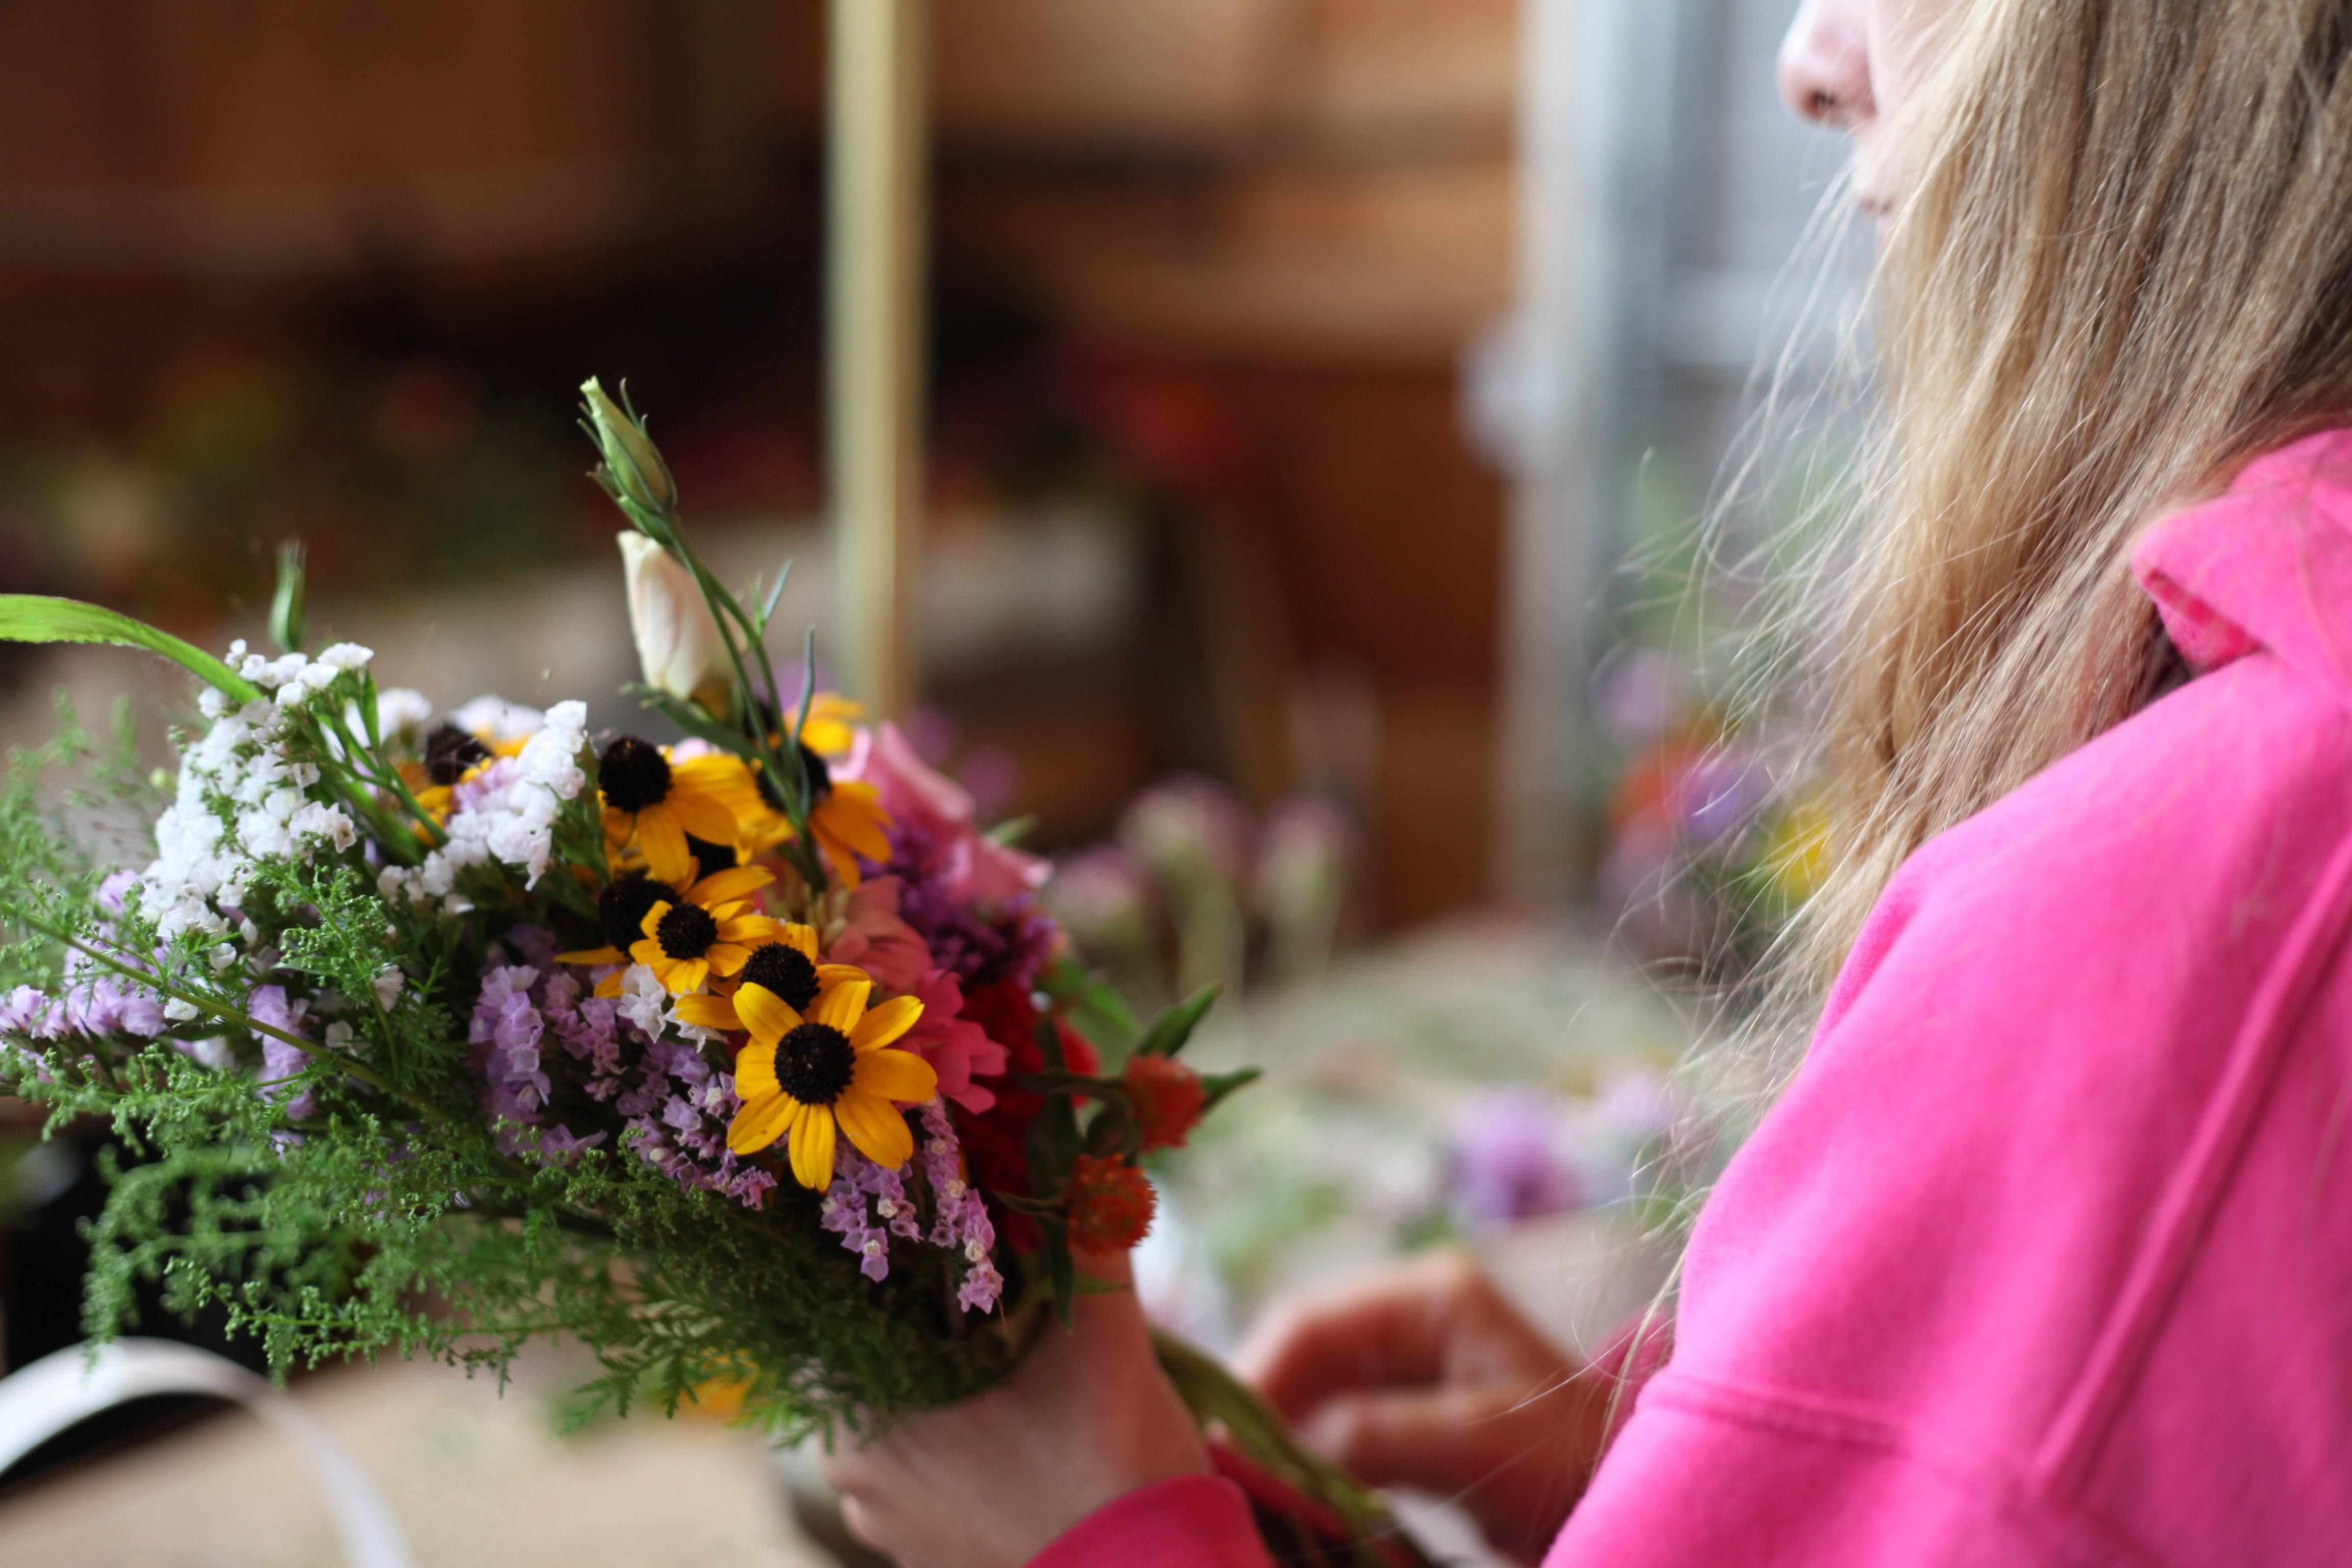 cody making bouquet